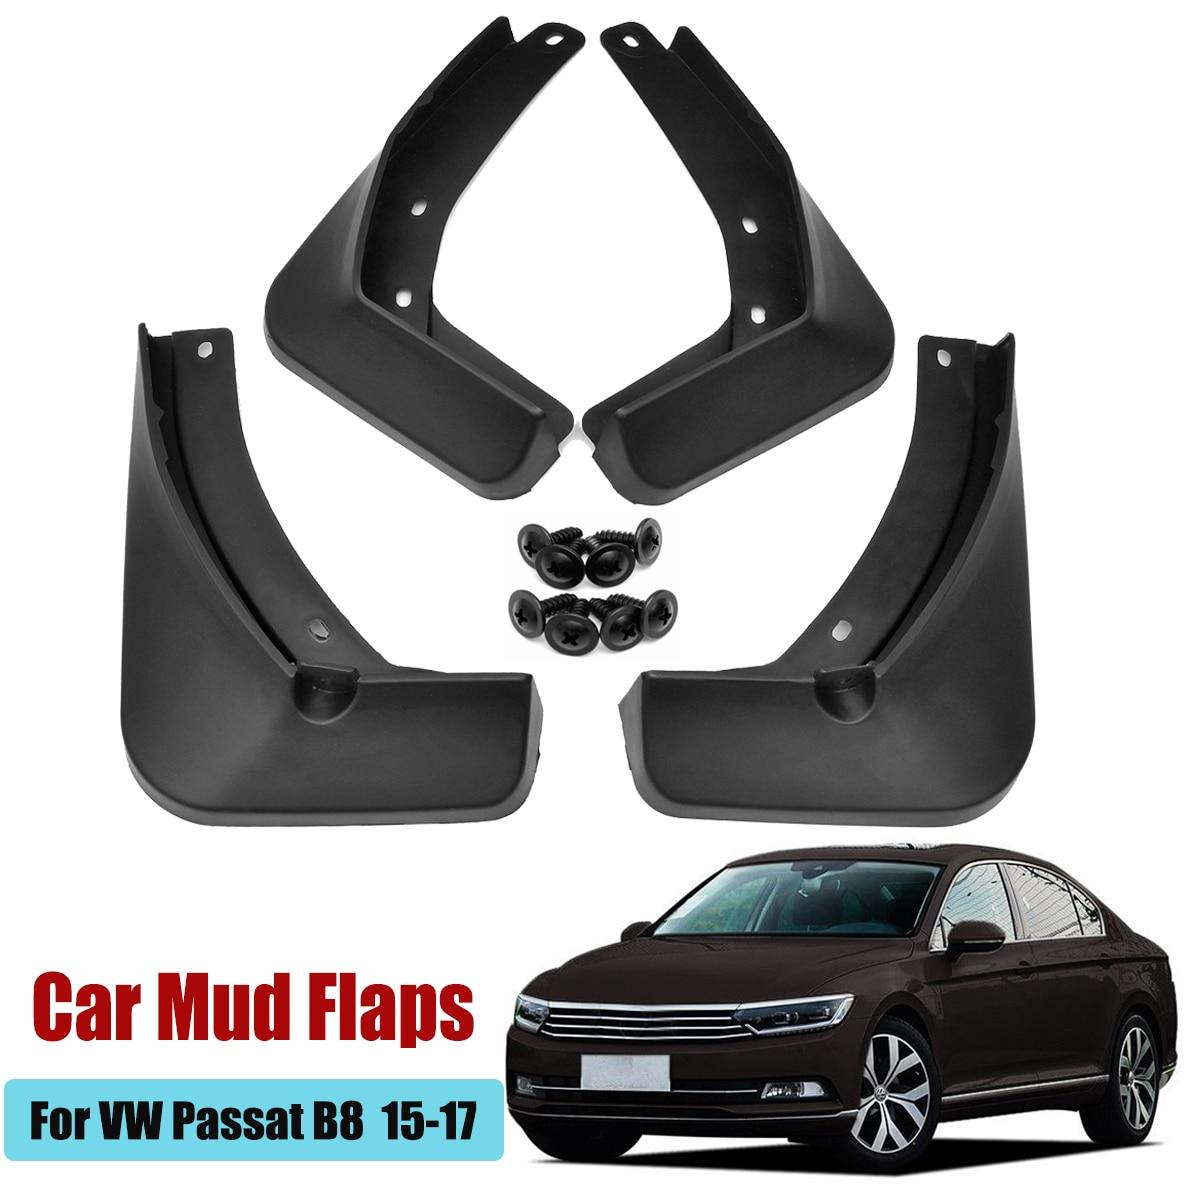 Car Mud Flaps Fender Splash Guards Mudguards Mudflaps Accessories for VW Passat B8 2015 2016 2017 2018 2019